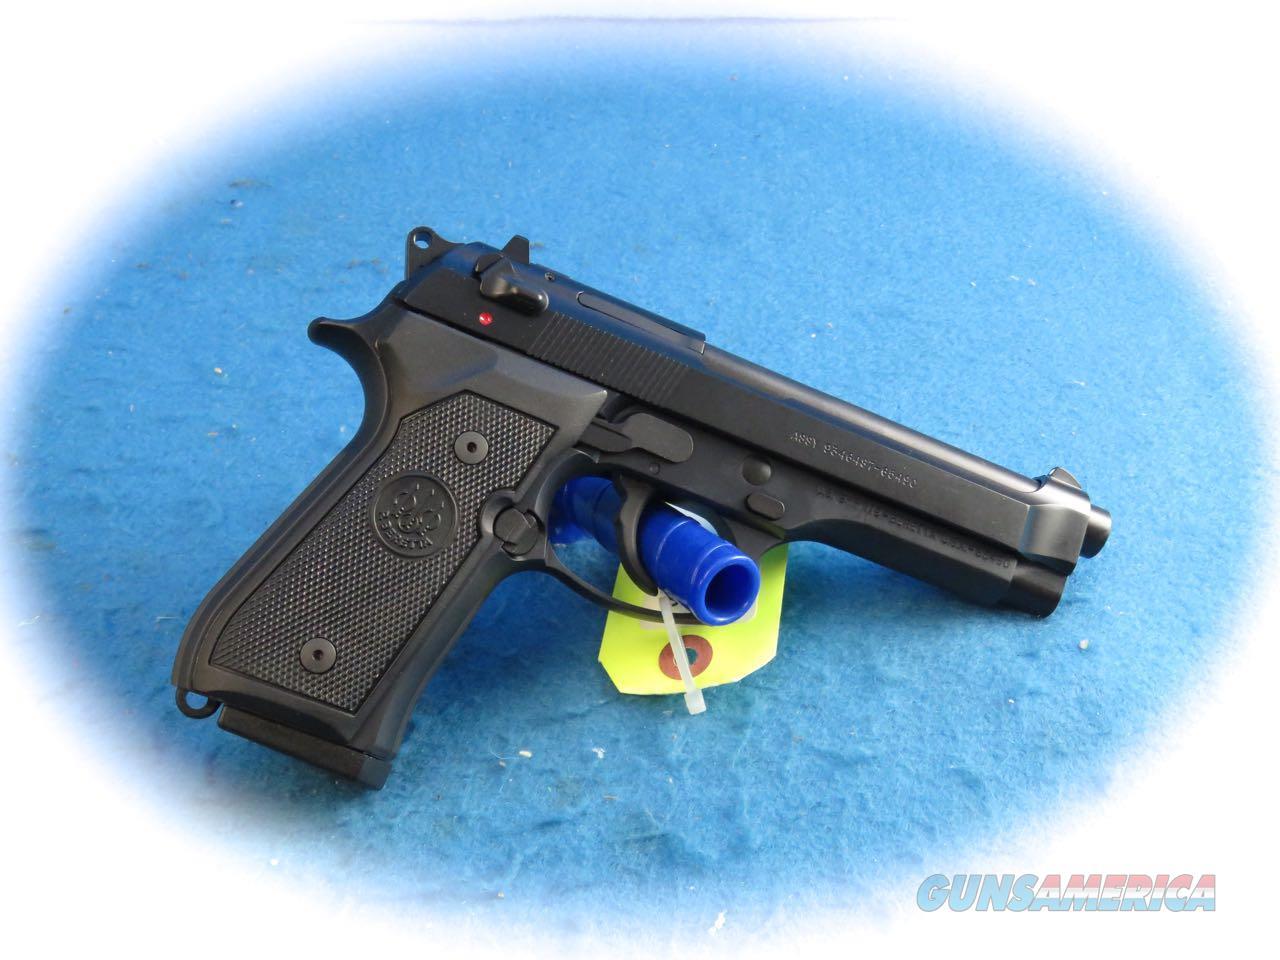 M9 handgun for sale - Apple discount military